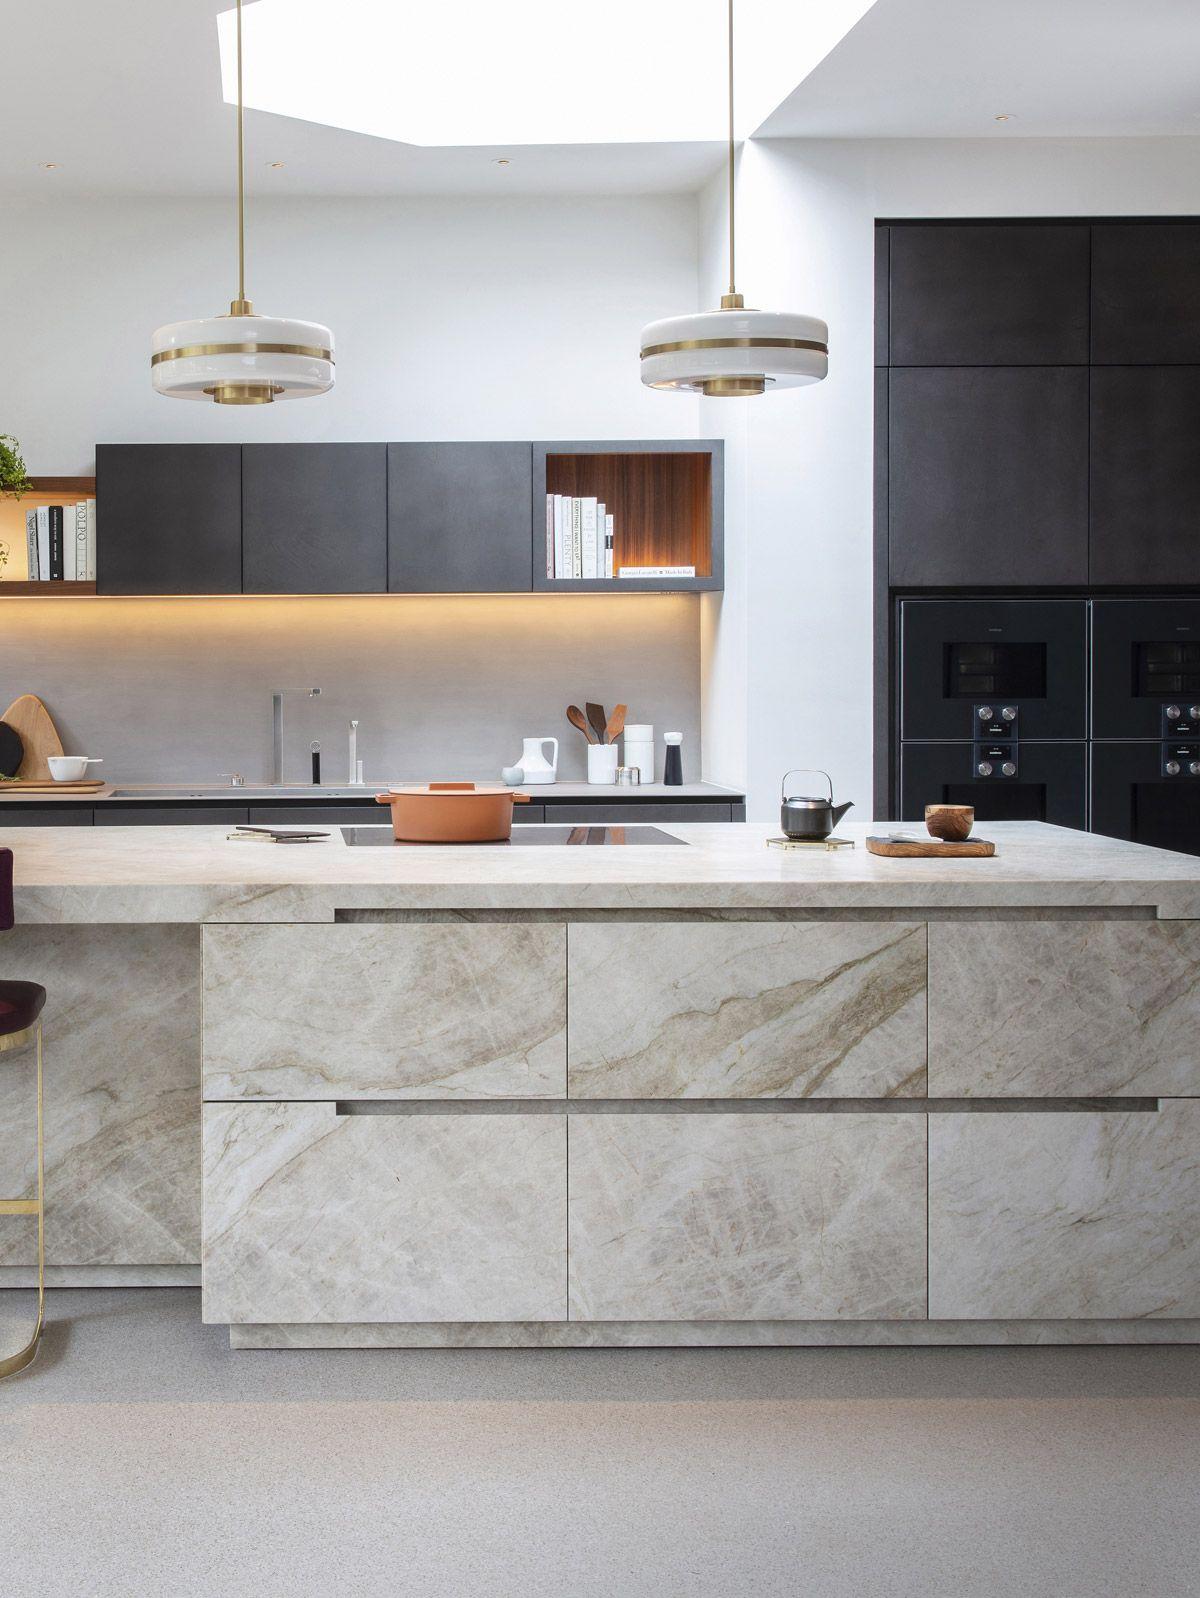 Modern Kitchen Design In 2020 Modern Kitchen Design Kitchen Design Modern Kitchen